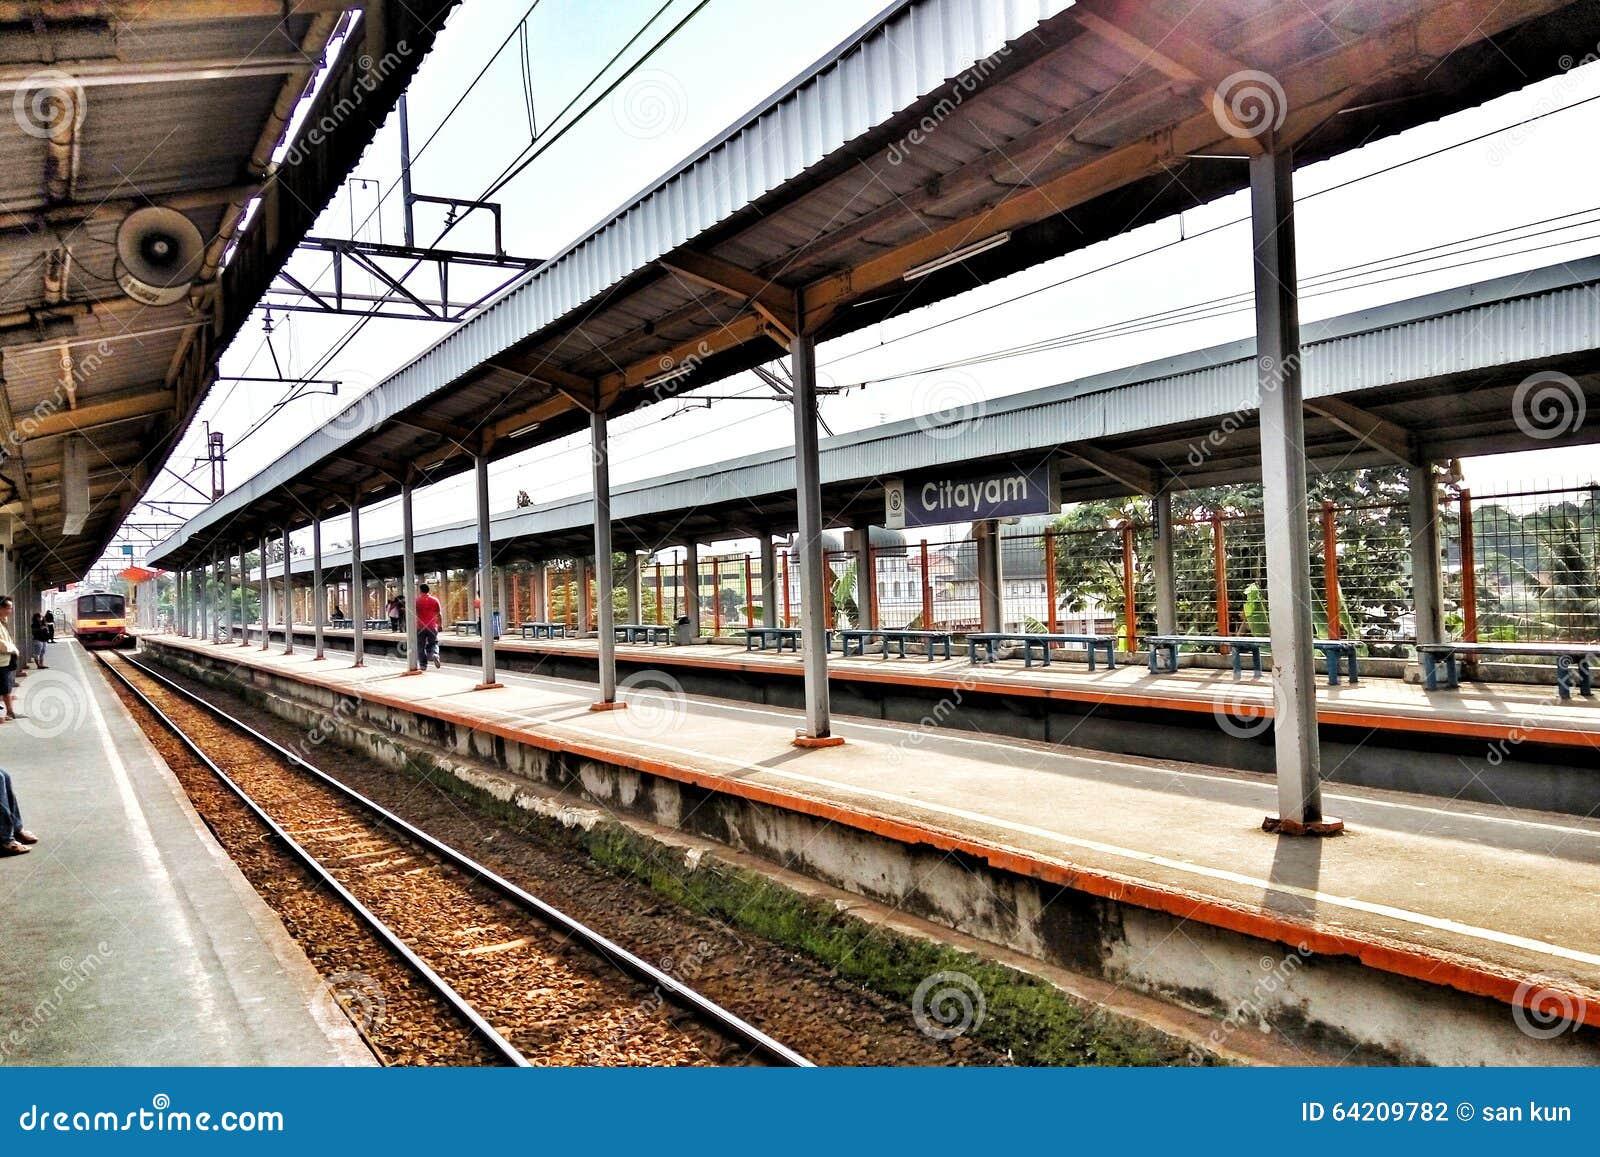 Tren que espera